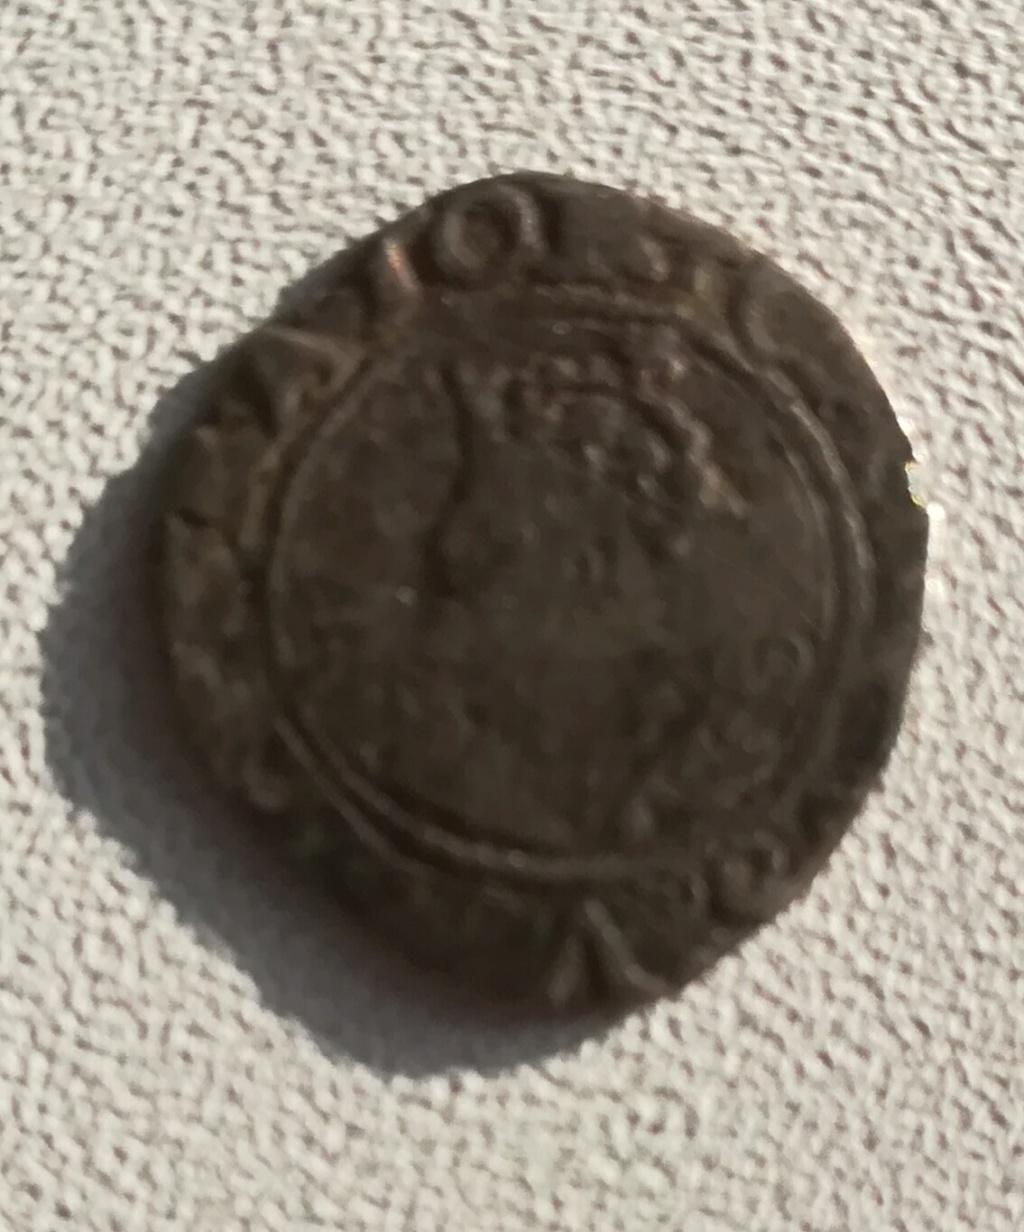 Demande d'identification monnaie féodale Img_2013